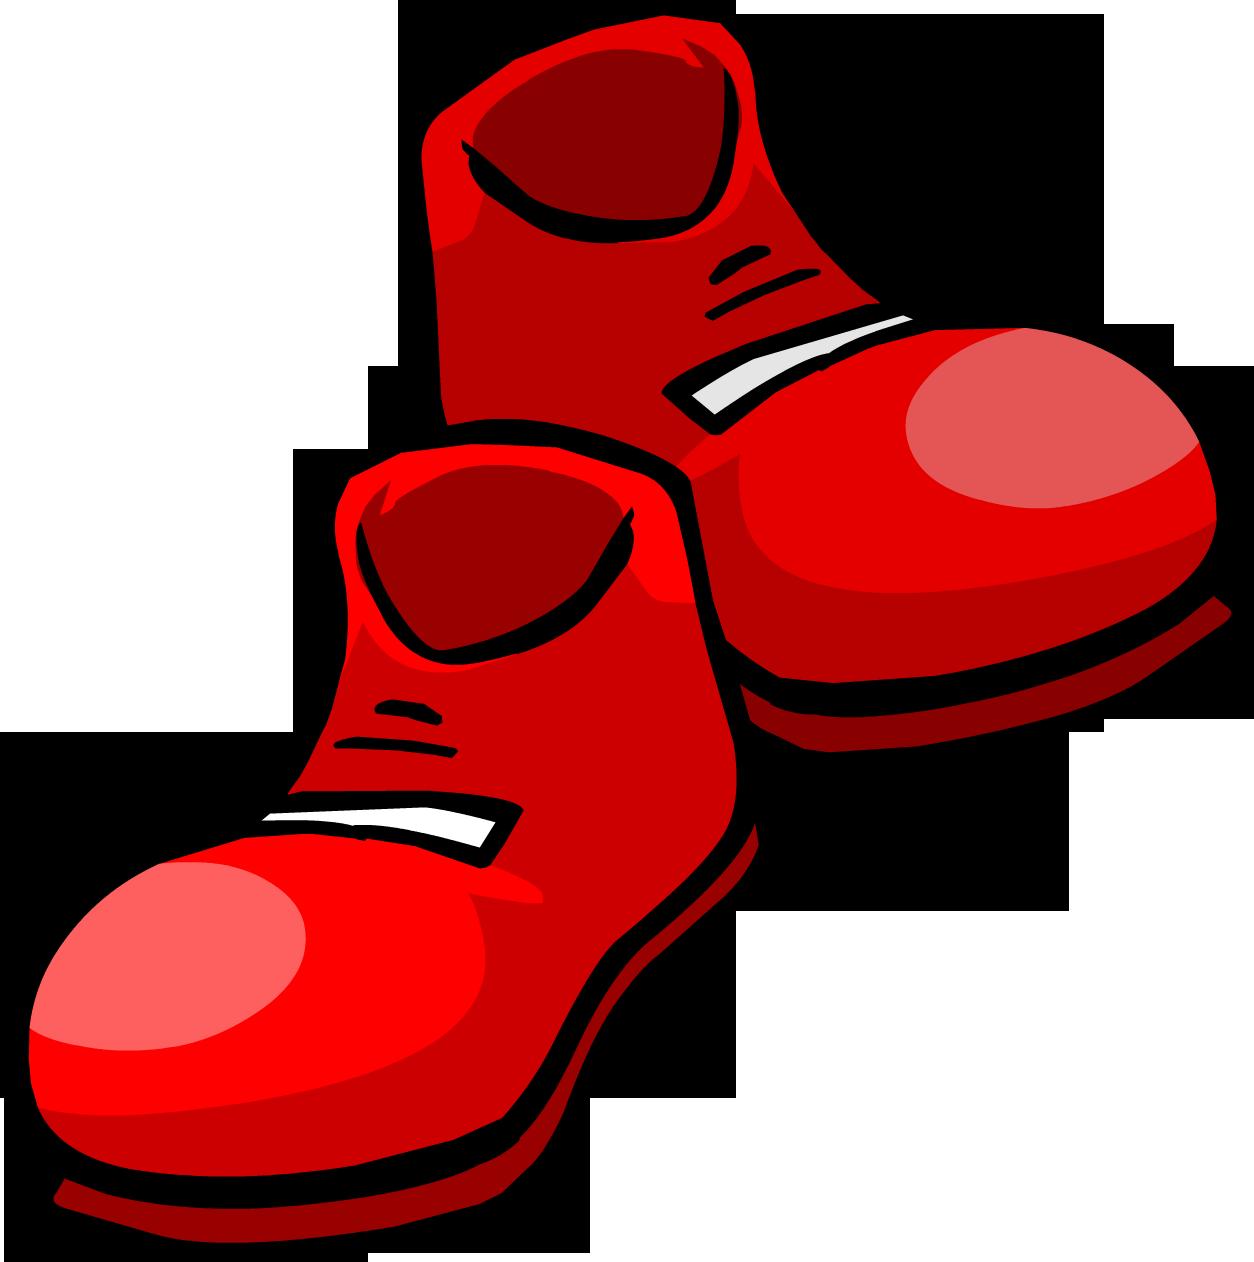 Shoe clipart sapatos #7